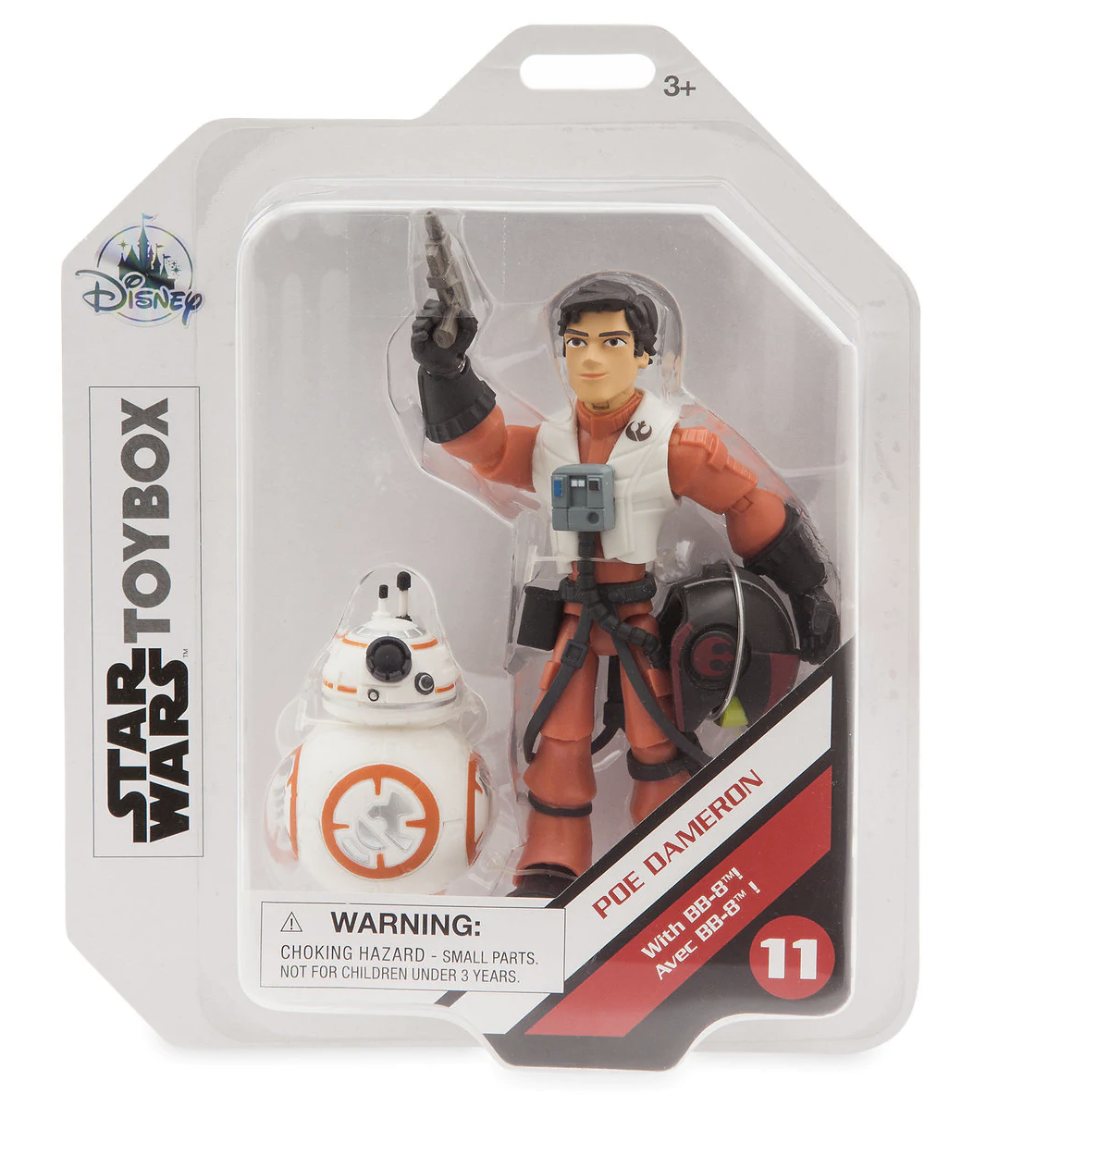 TROS Poe Dameron with BB-8 Toybox Figure Set 1